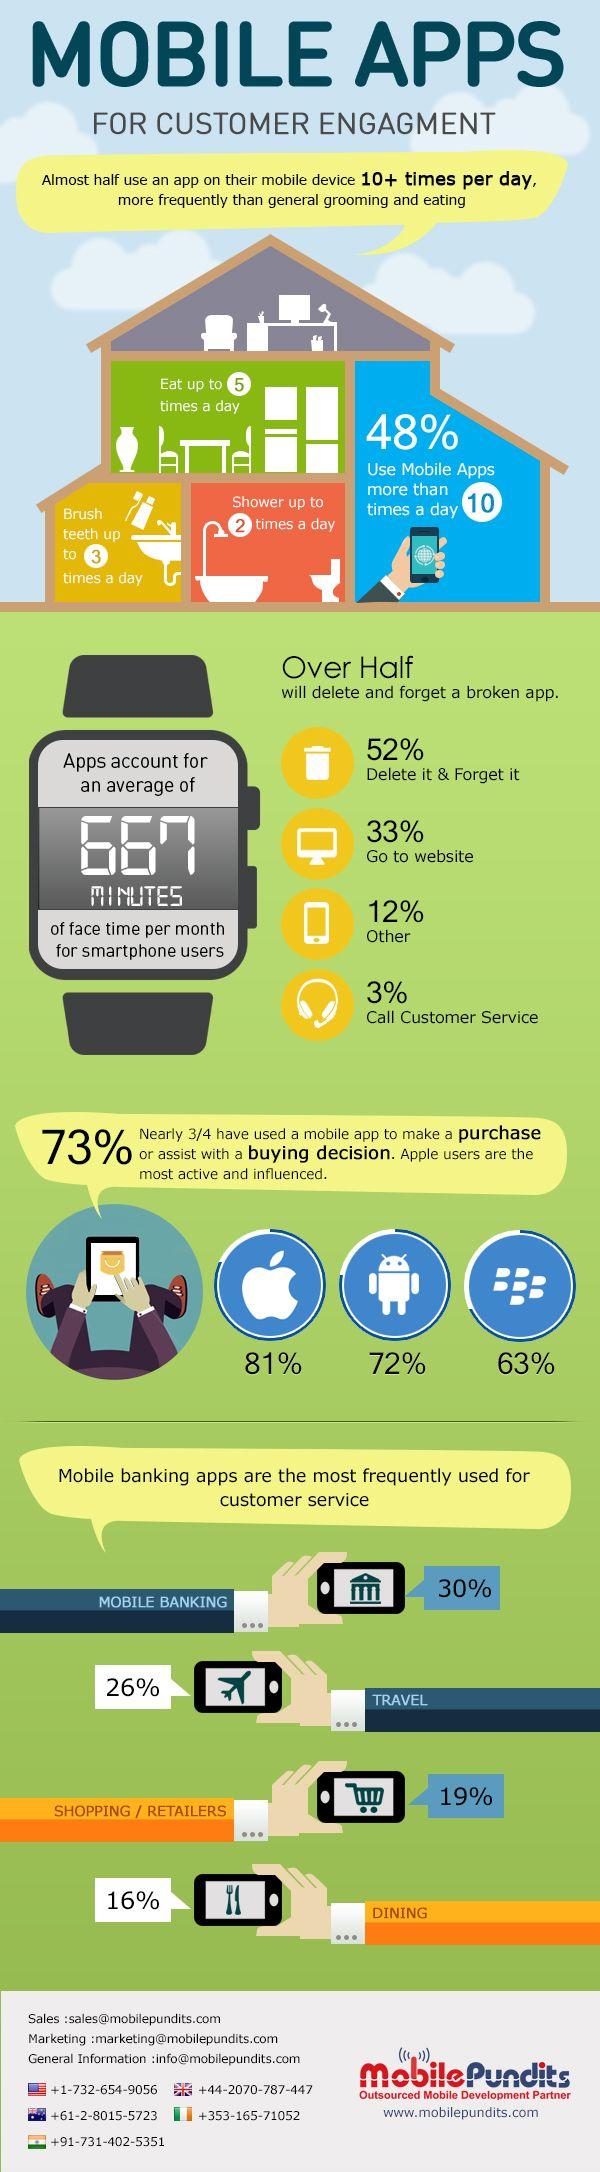 Mobile Apps For Customer Engagement